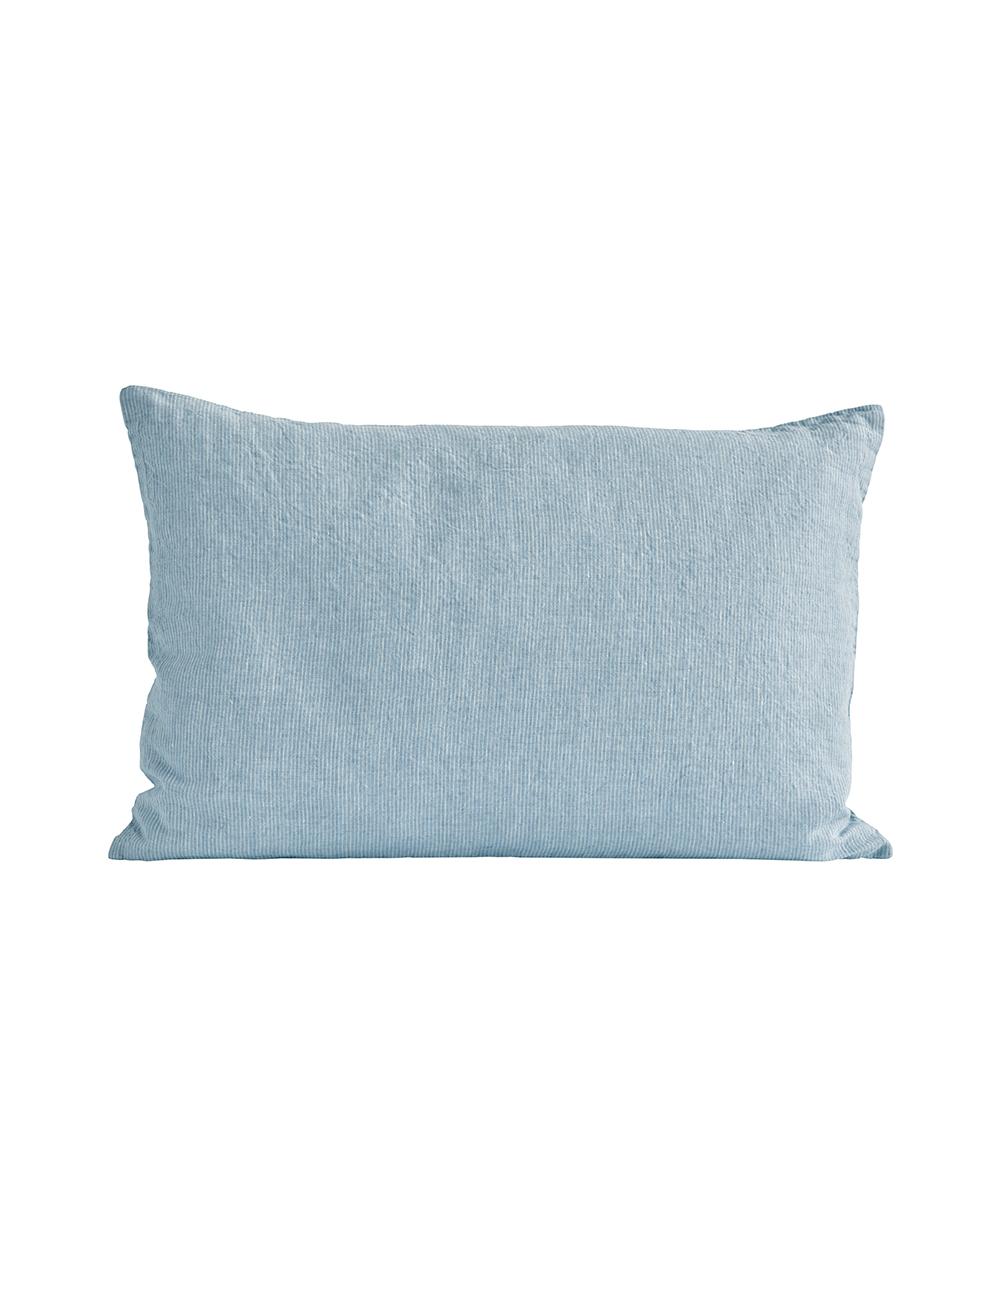 Sky Pinstriped Linen Cushion Cover 40x60cm